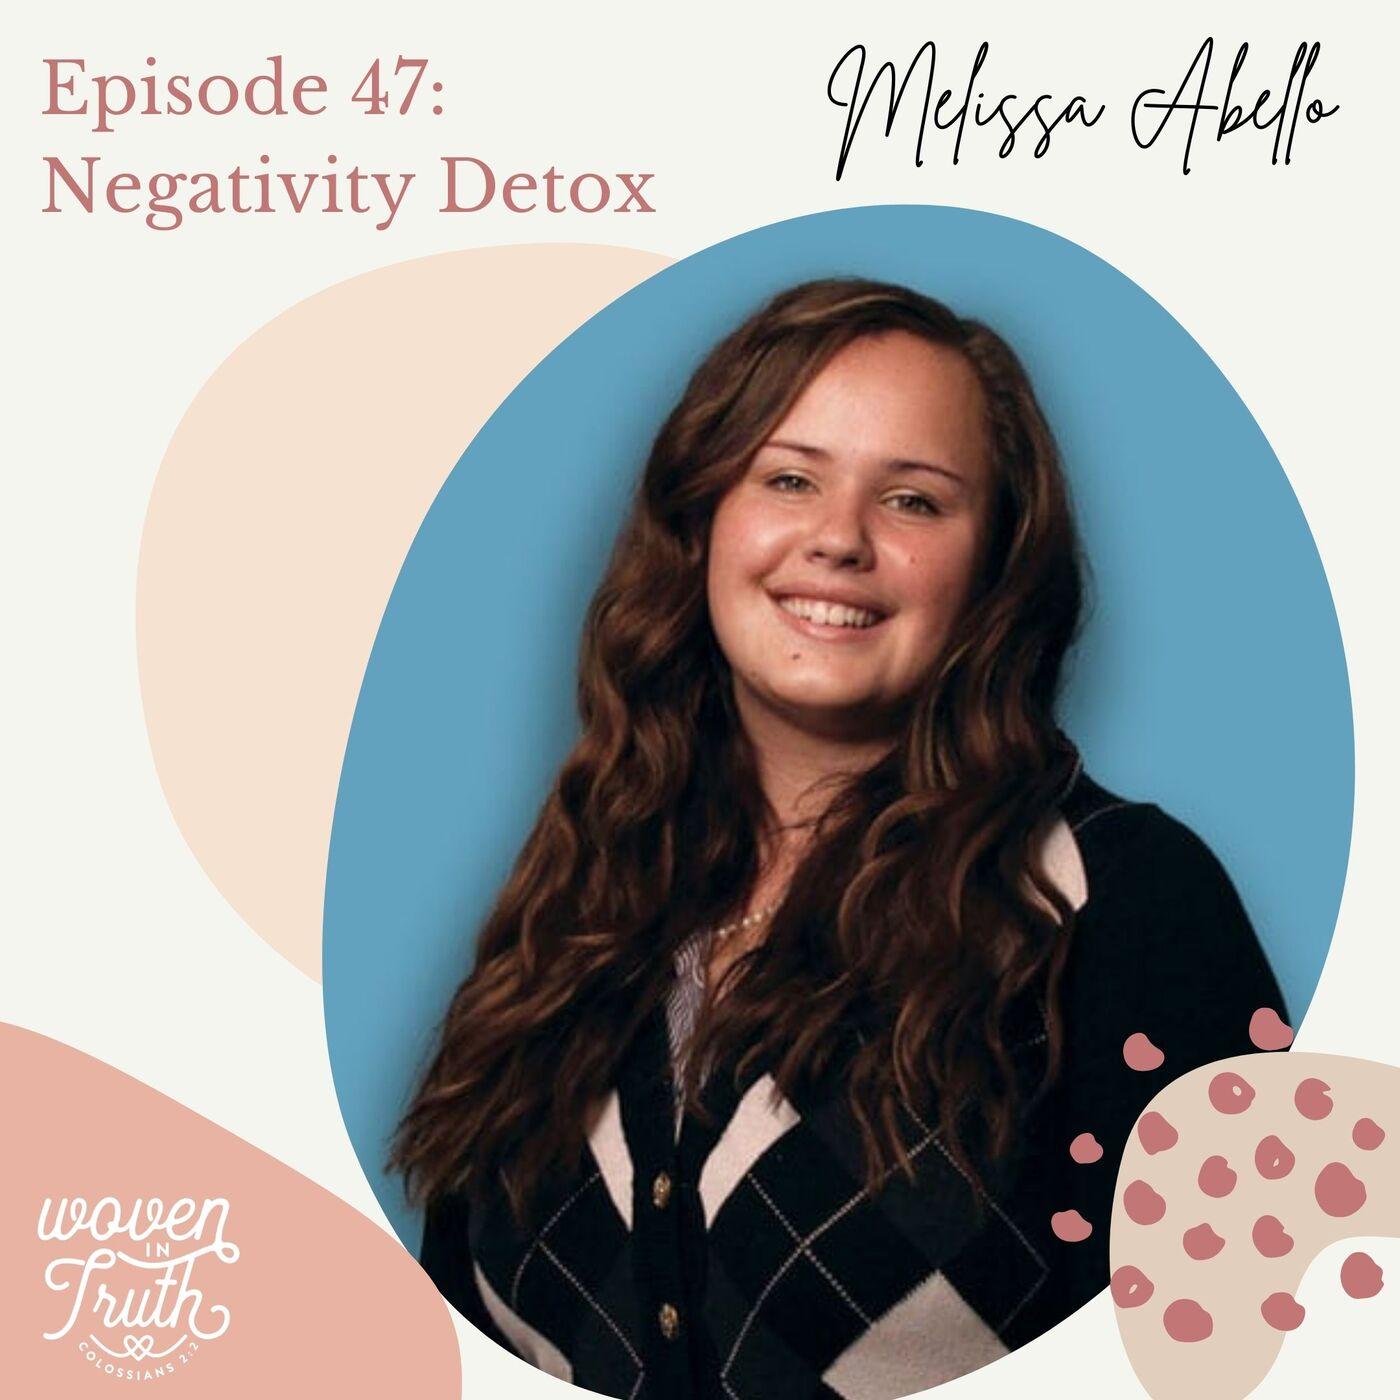 Negativity Detox